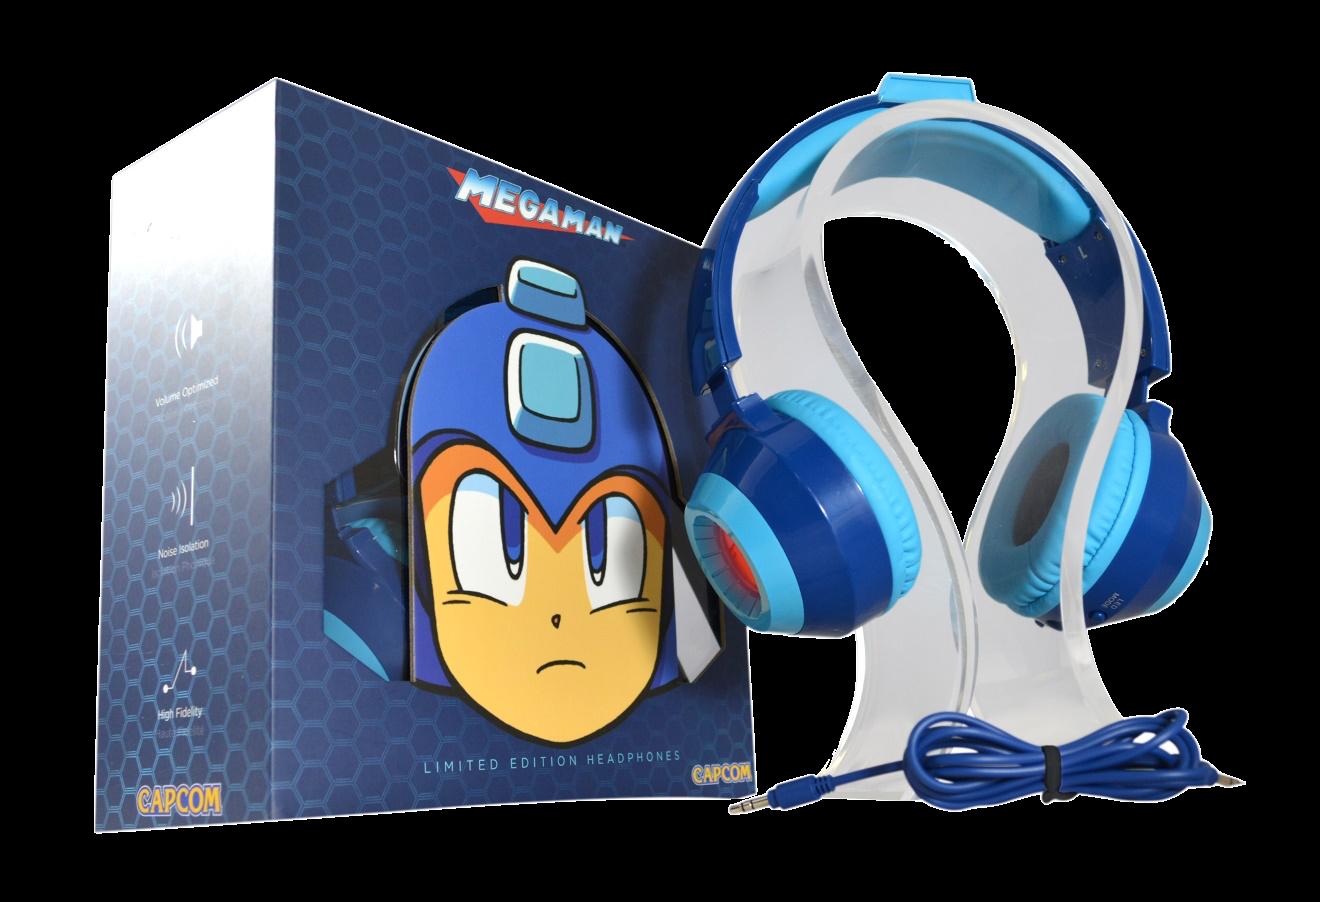 e-concept-megaman-headphones-toyslife